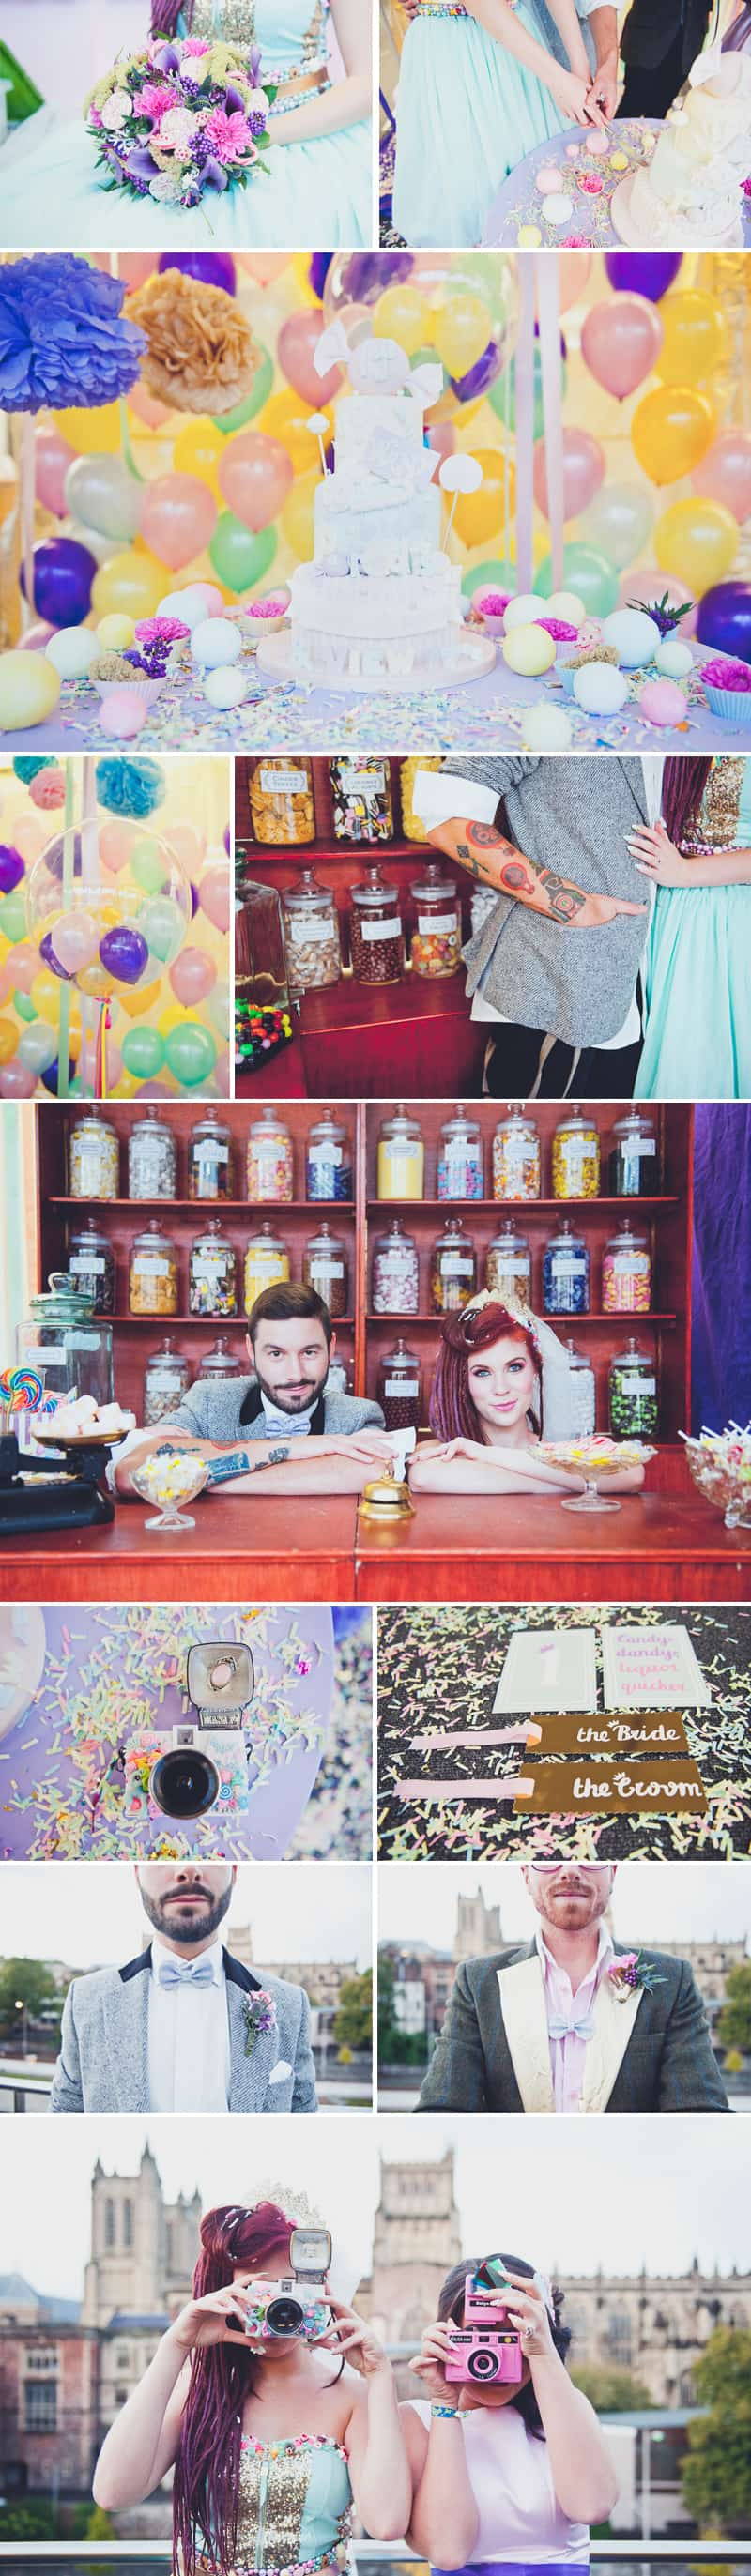 Willy Wonka Weird Wonderful Wedding World 6